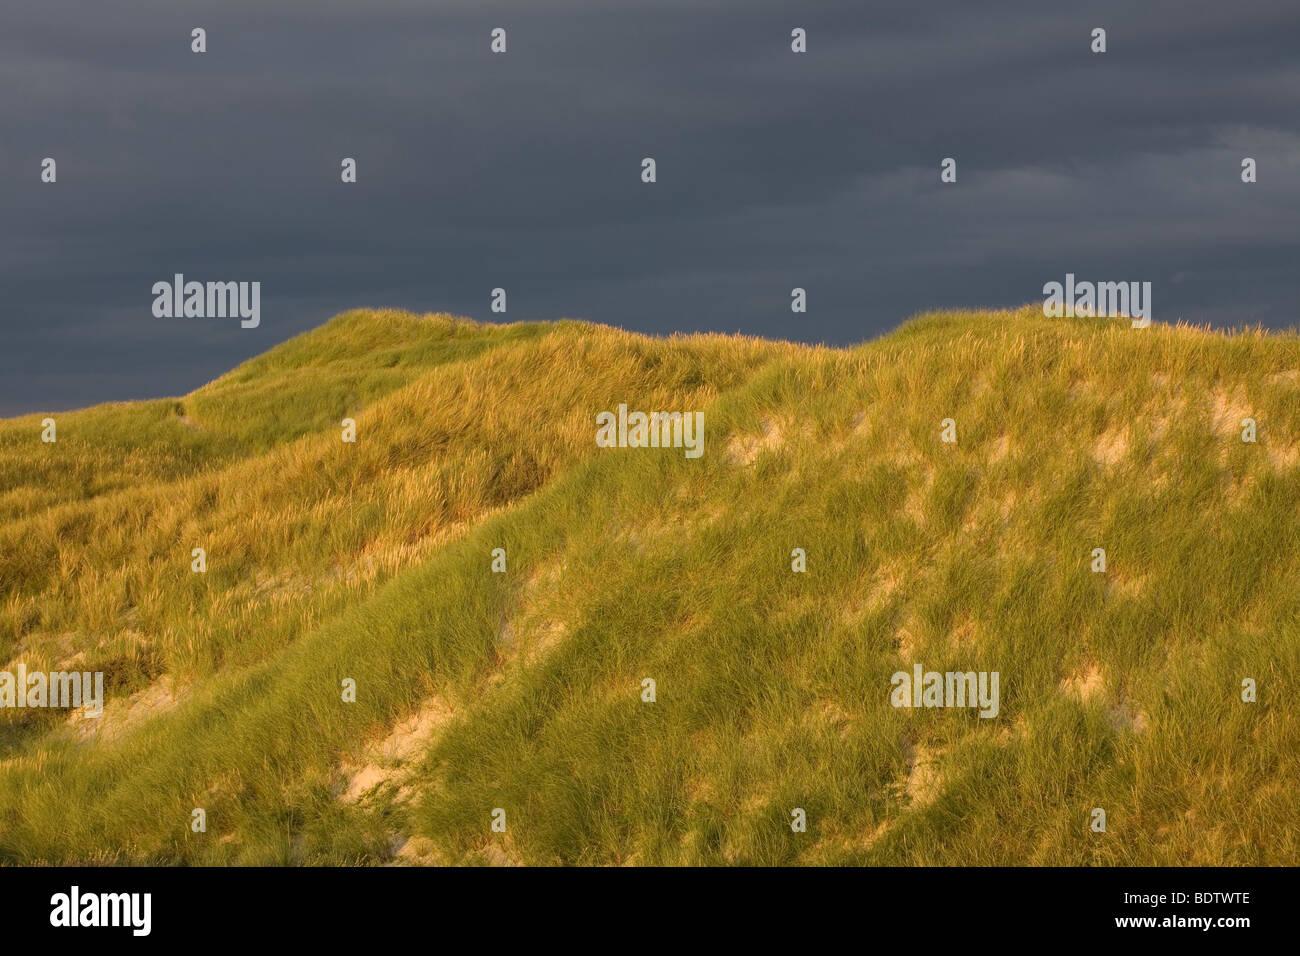 Duenenlandschaft, Dune (dene) scenery, Jylland - Daenemark Stock Photo